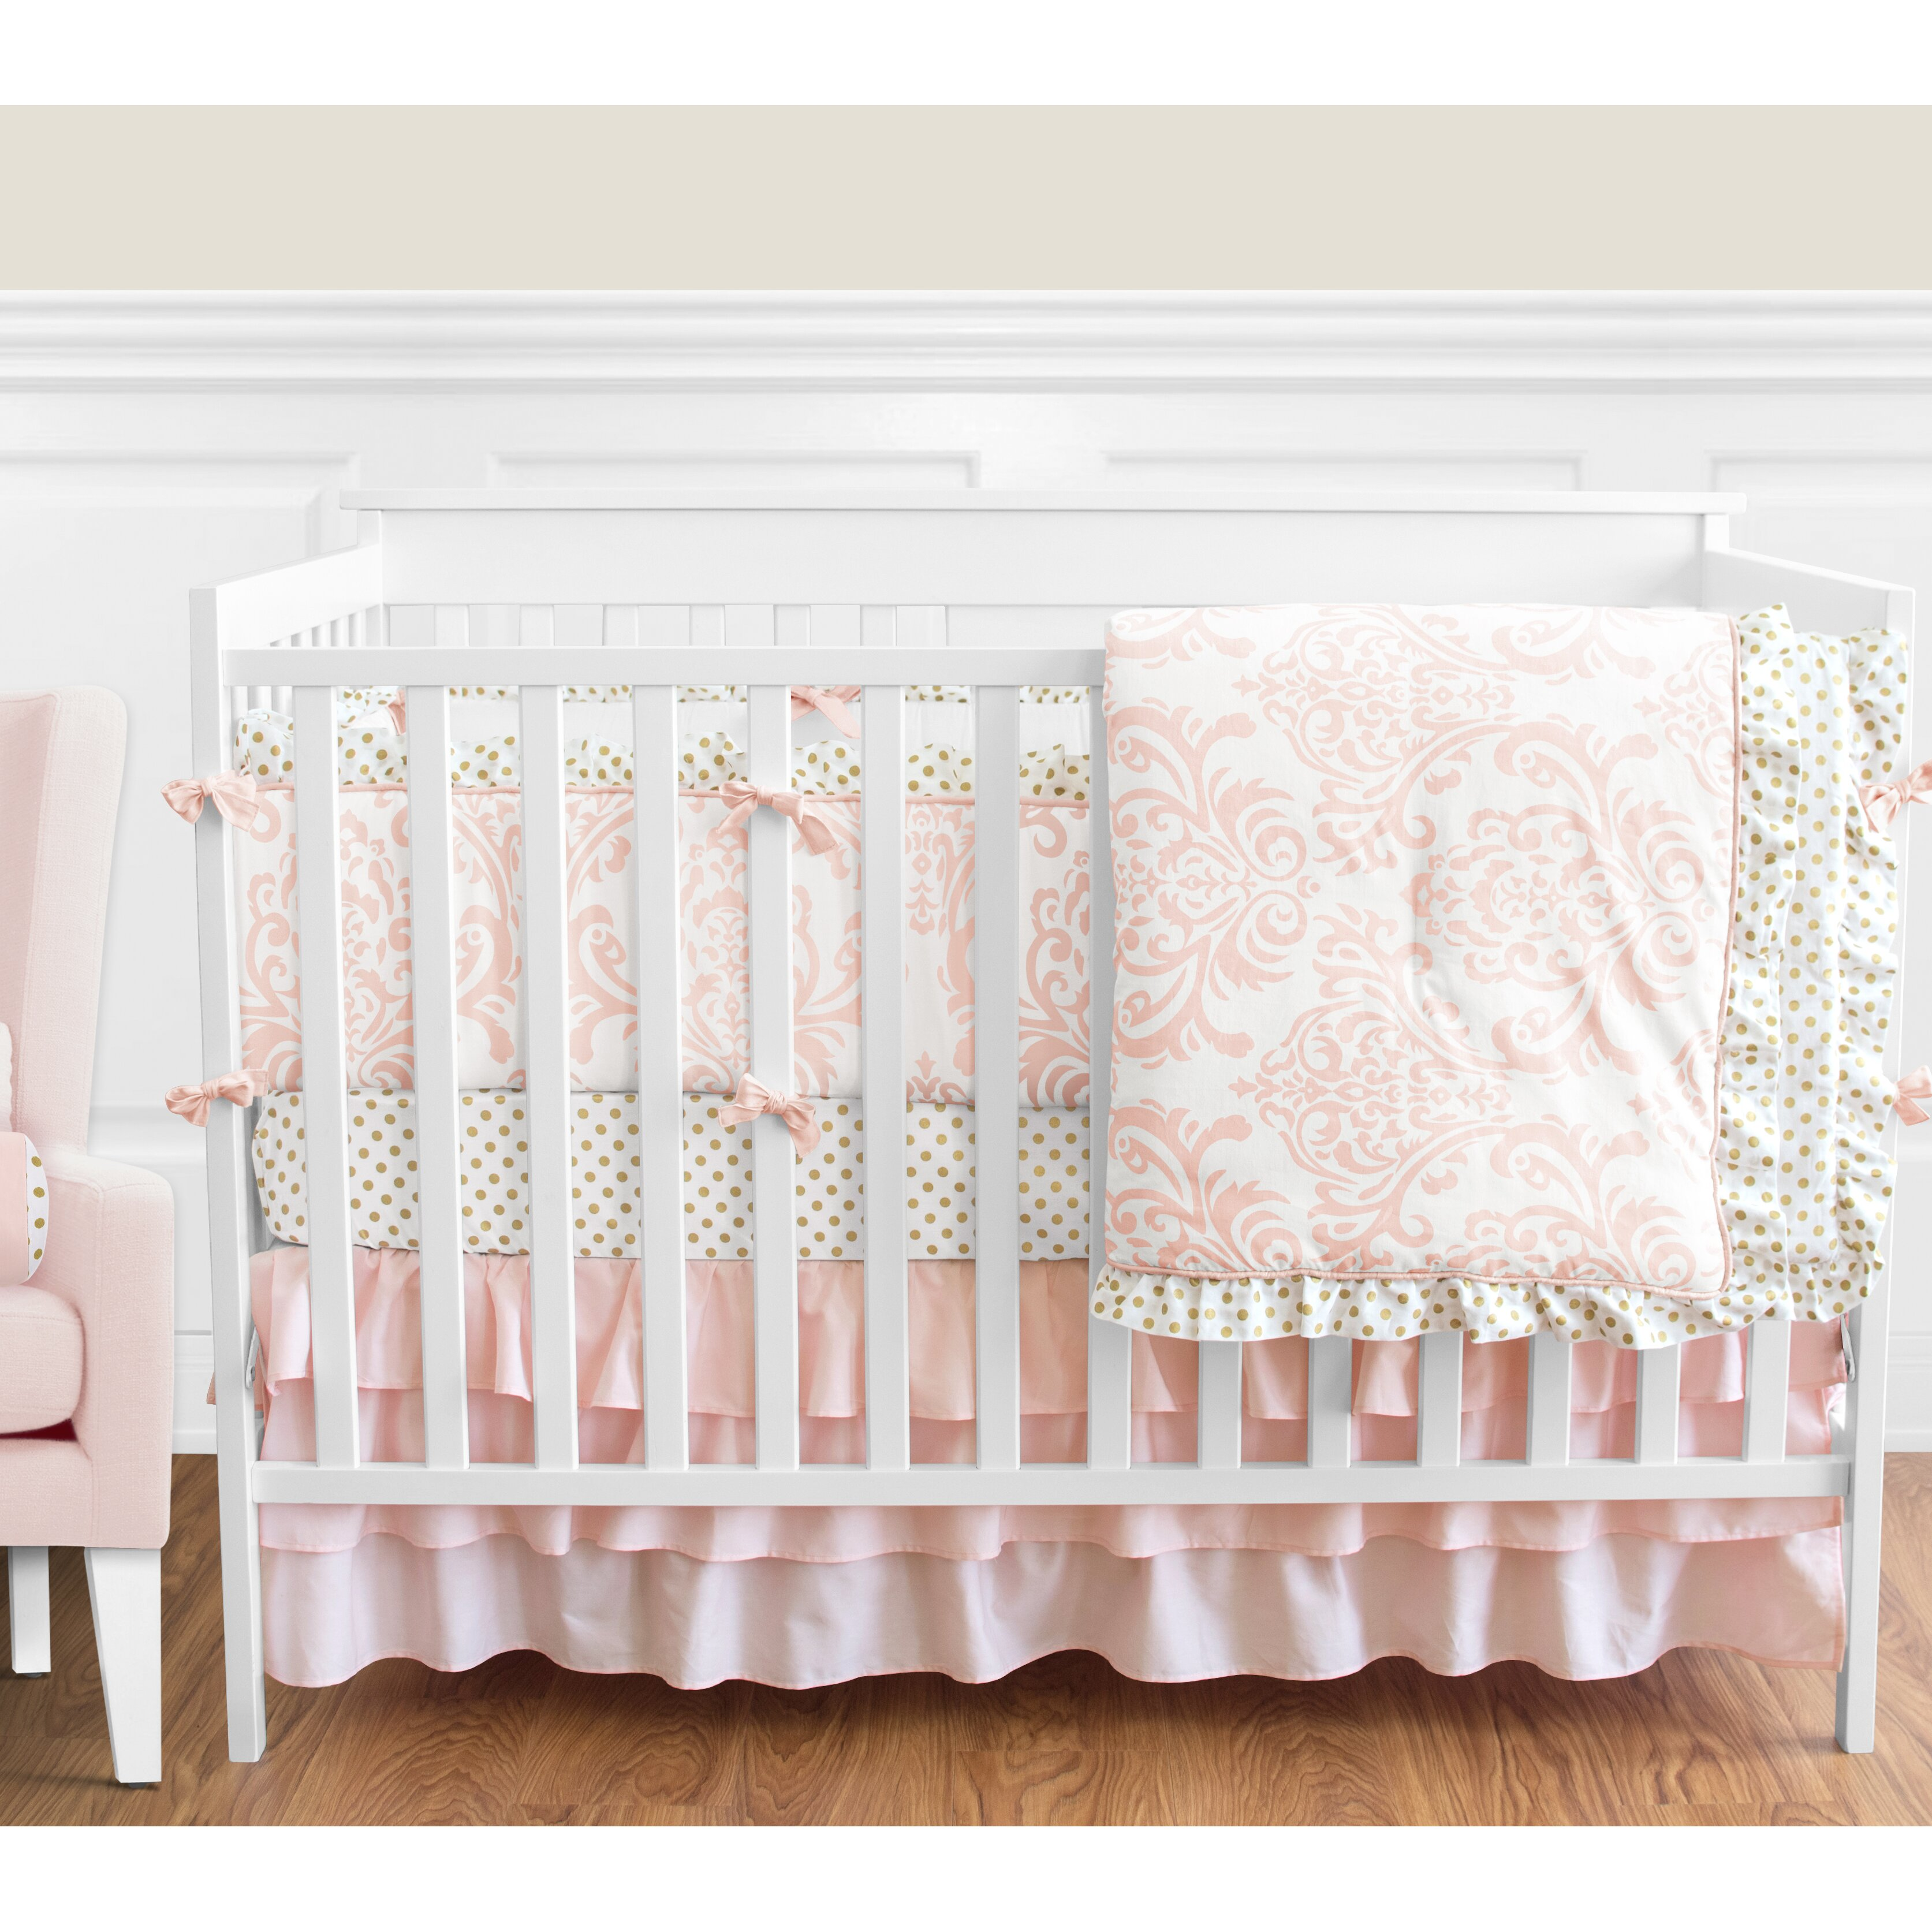 Sweet Jojo Designs Amelia 9 Piece Crib Bedding Set